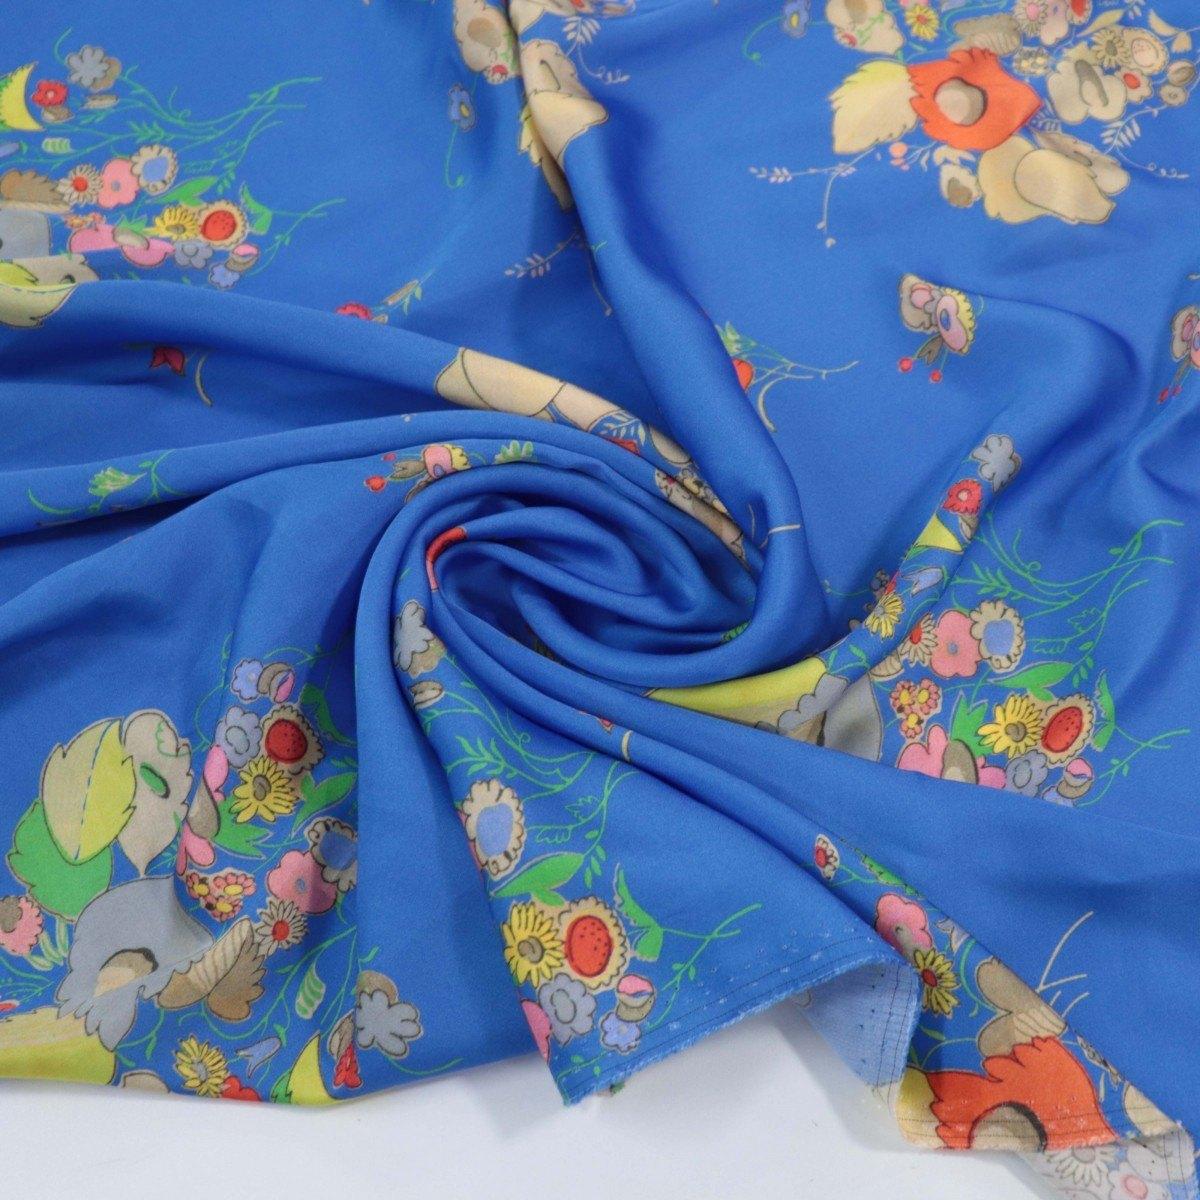 Tecido Crepe de Viscose Italiano Floral Abstrato Azul